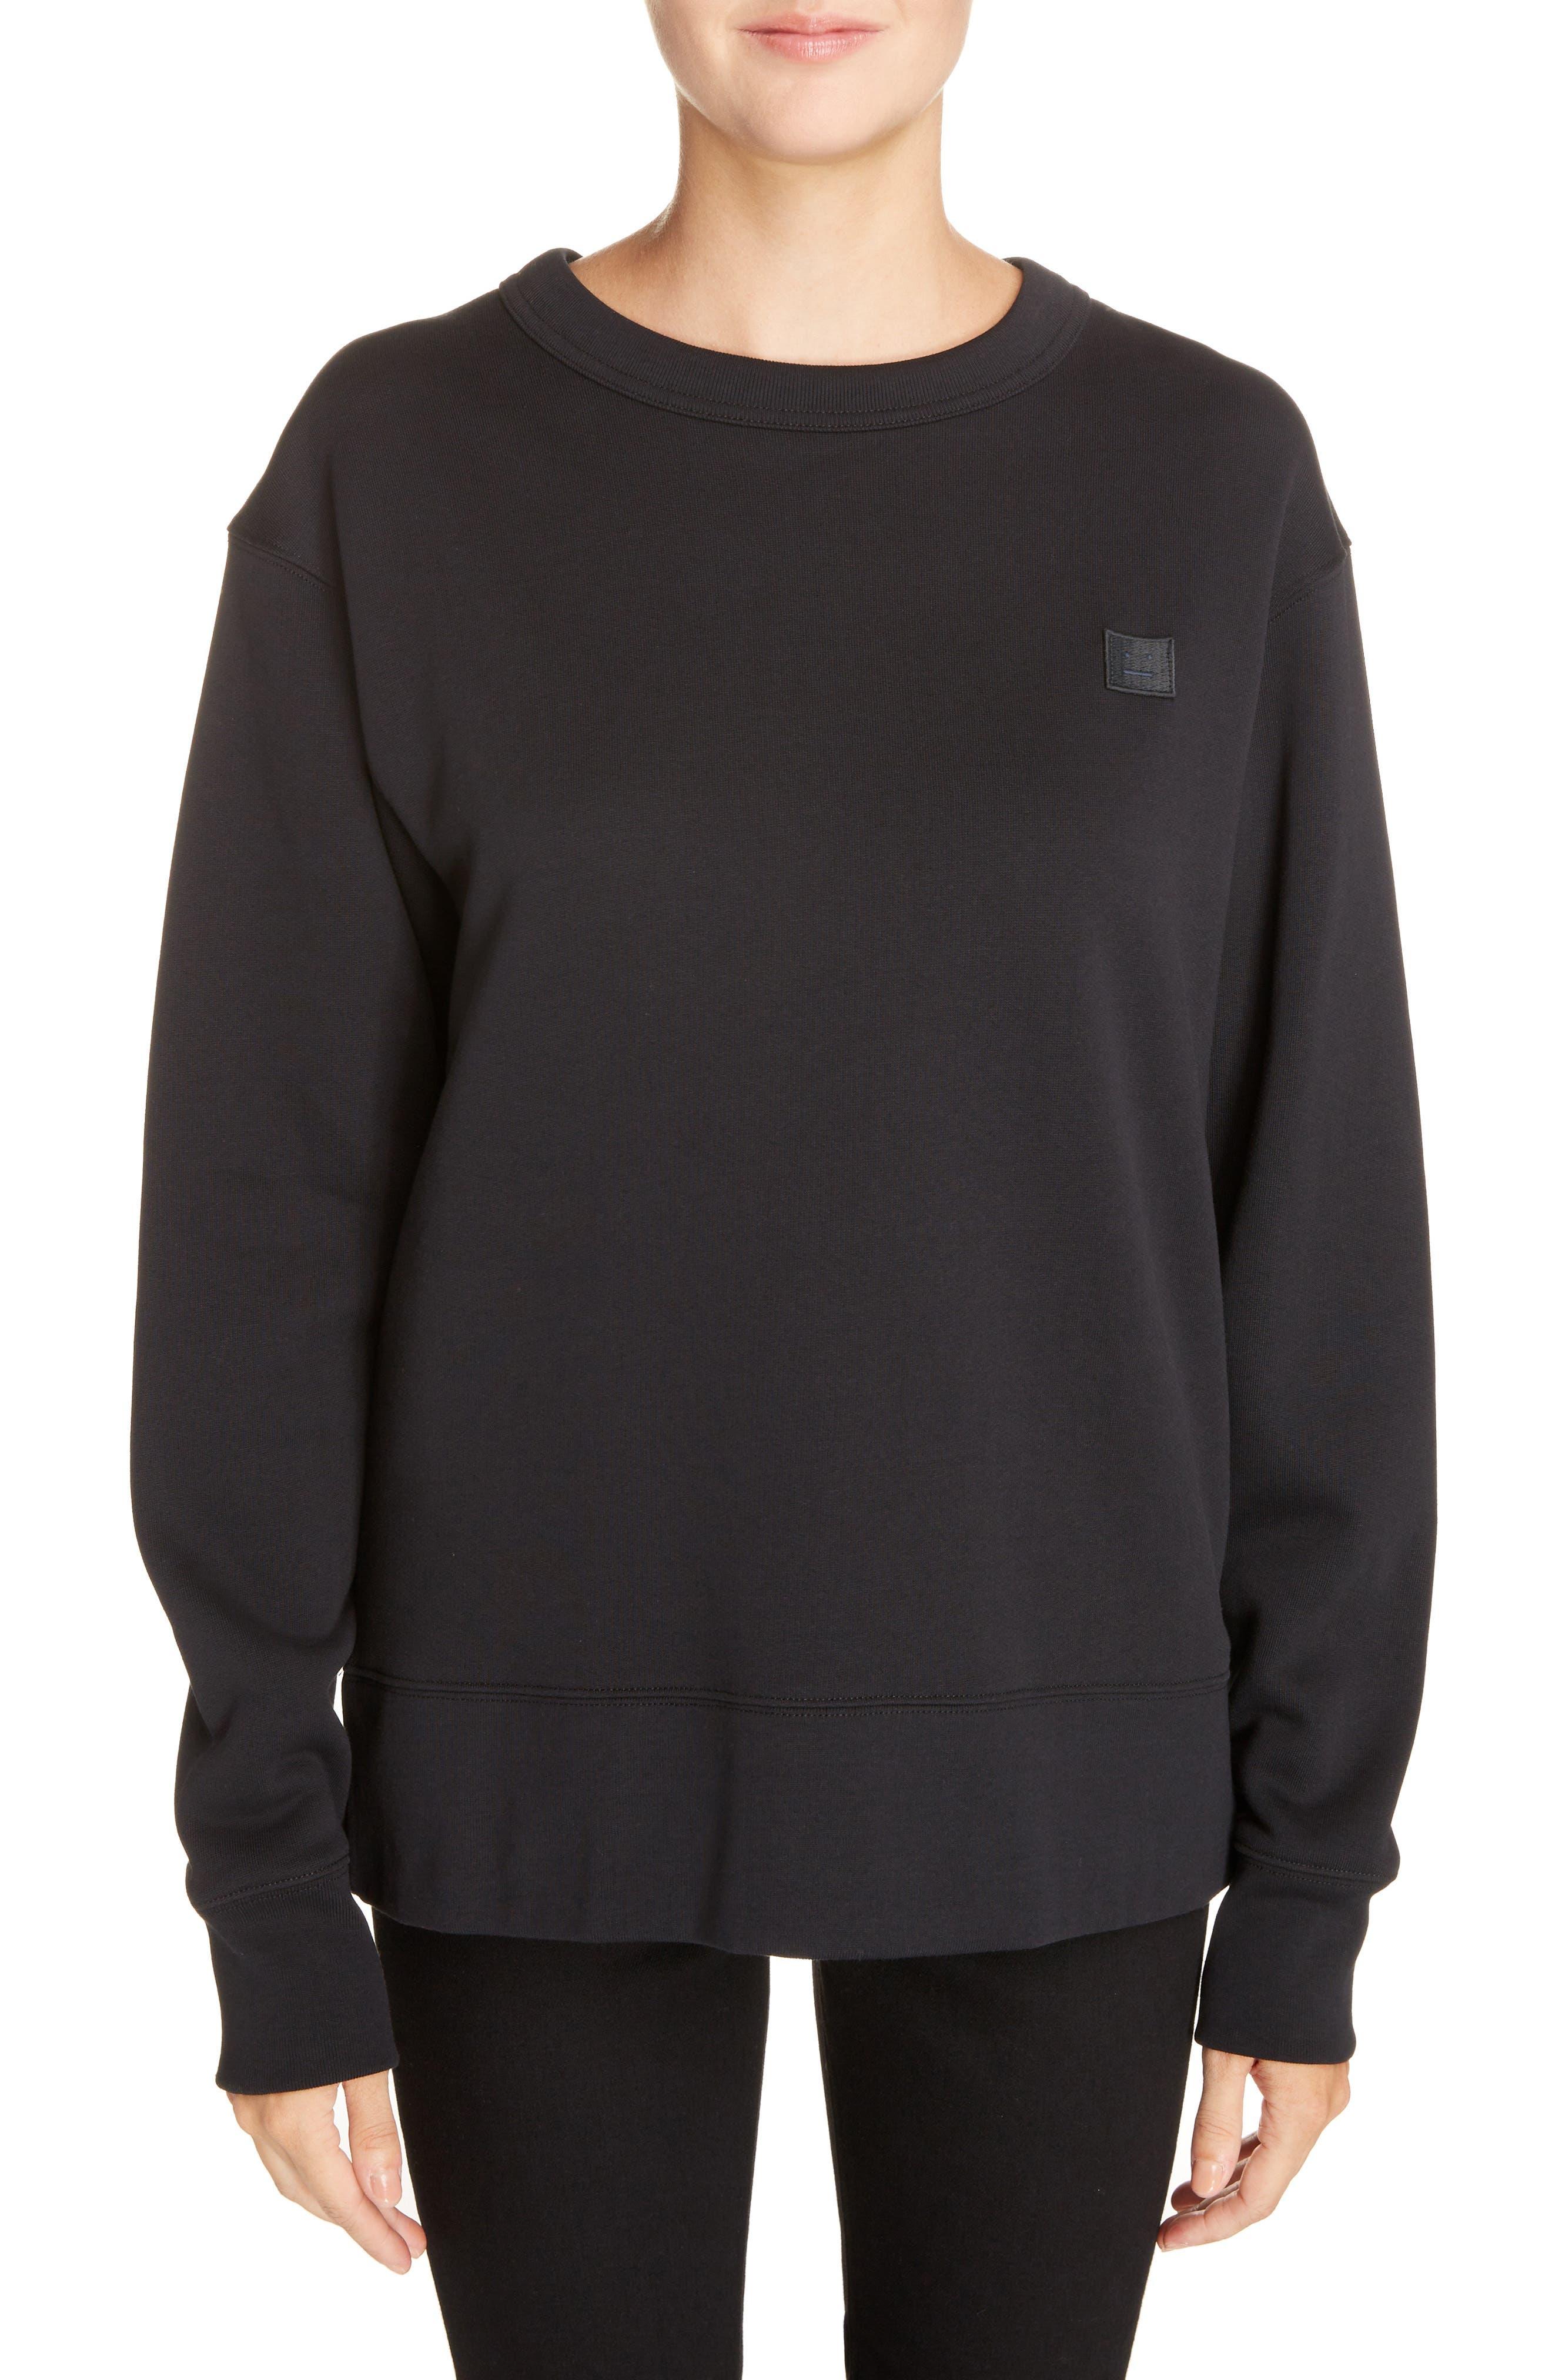 Fairview Crewneck Sweatshirt,                         Main,                         color, 001